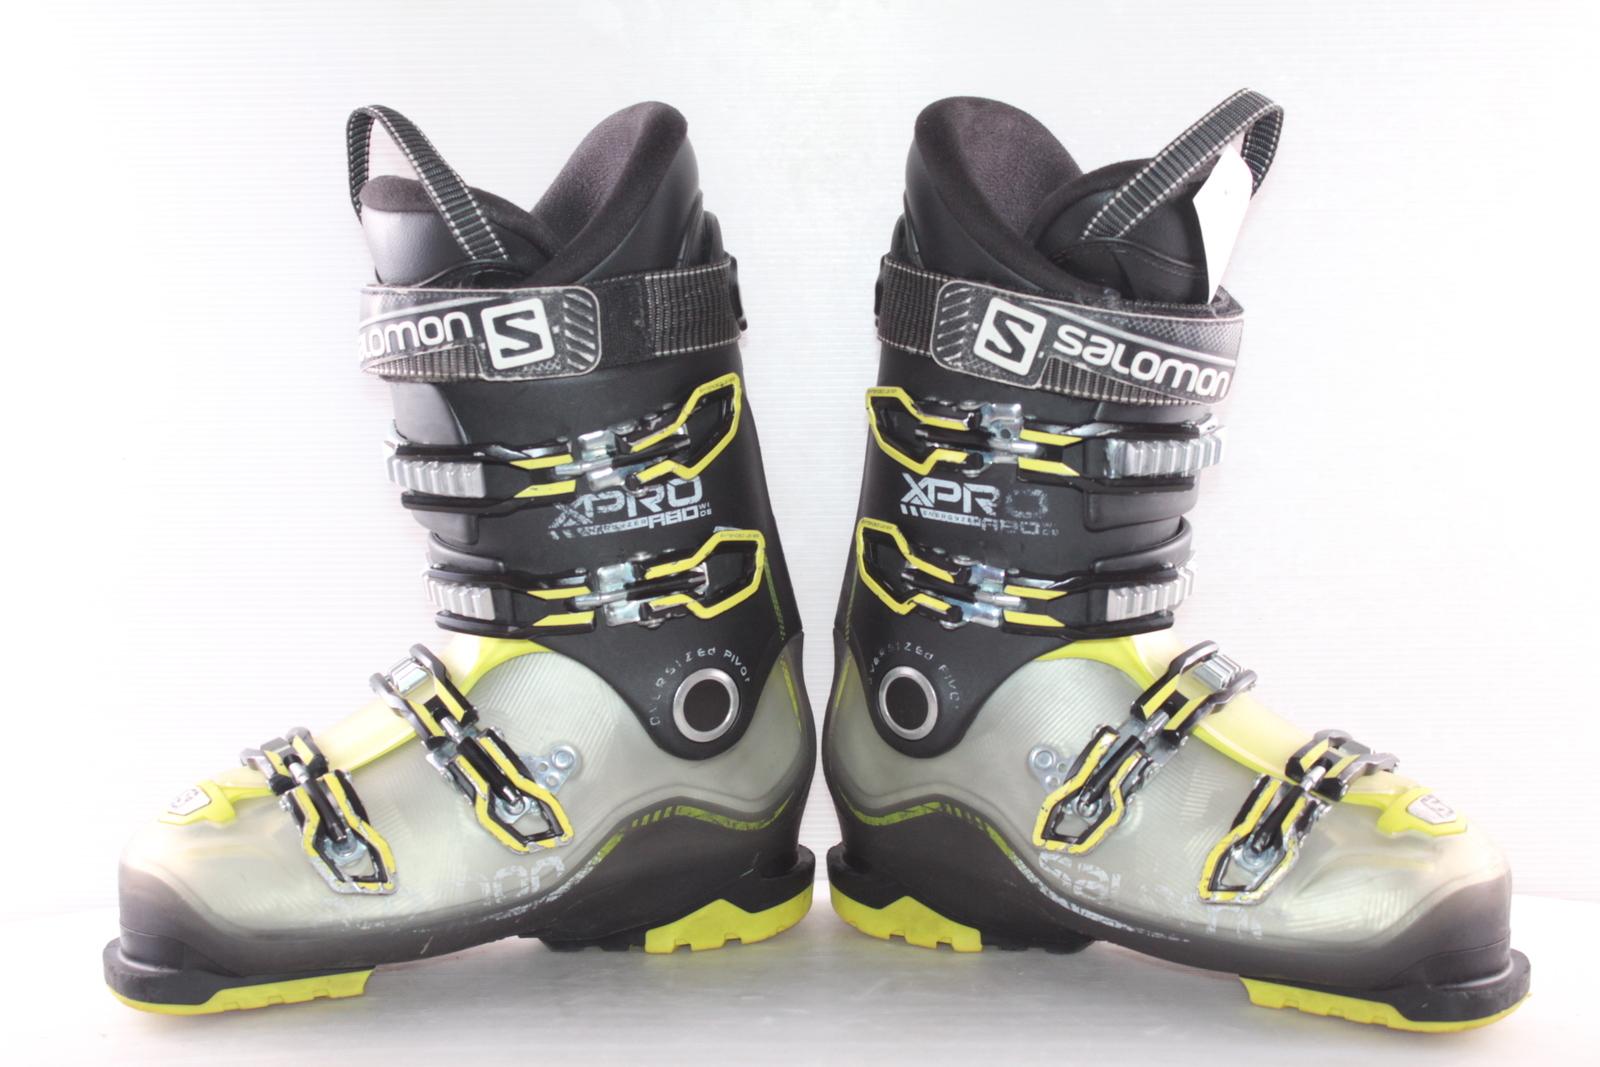 Lyžařské boty Salomon X Pro R80 wide vel. EU41 flexe 80